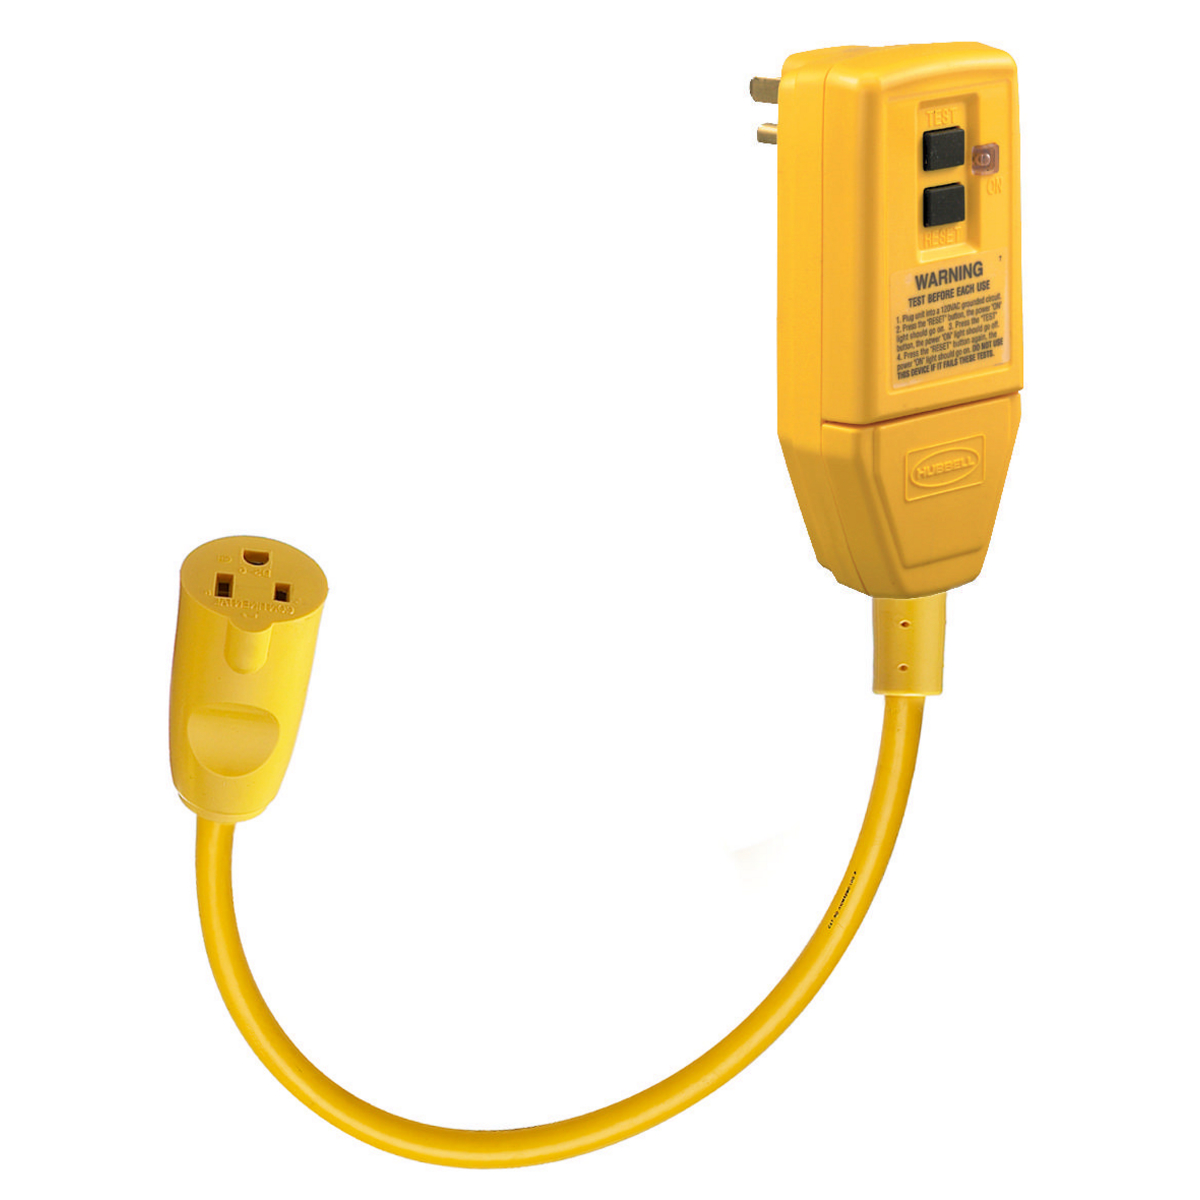 Hubbell GFP1CGFCI Plug, 15A 120V, 1' CORD